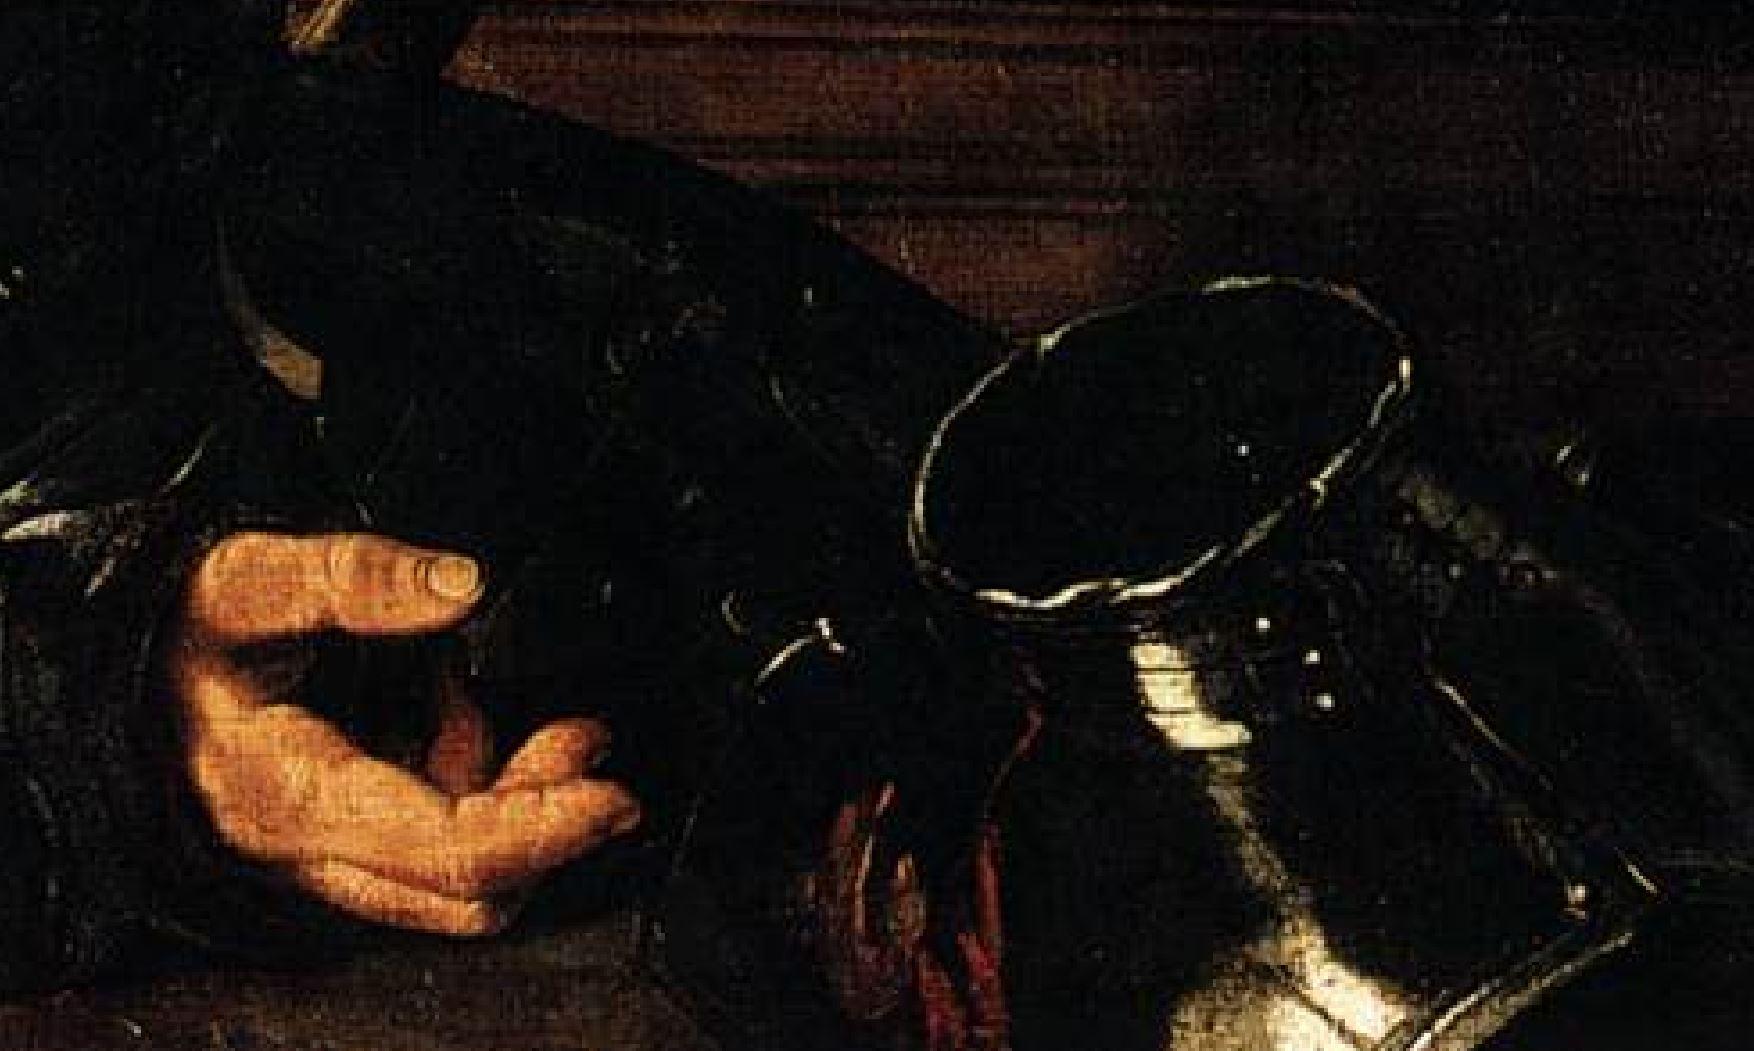 Giovanni_Gerolamo_Savoldo_Autoportrait Vers 1525 Louvre detail